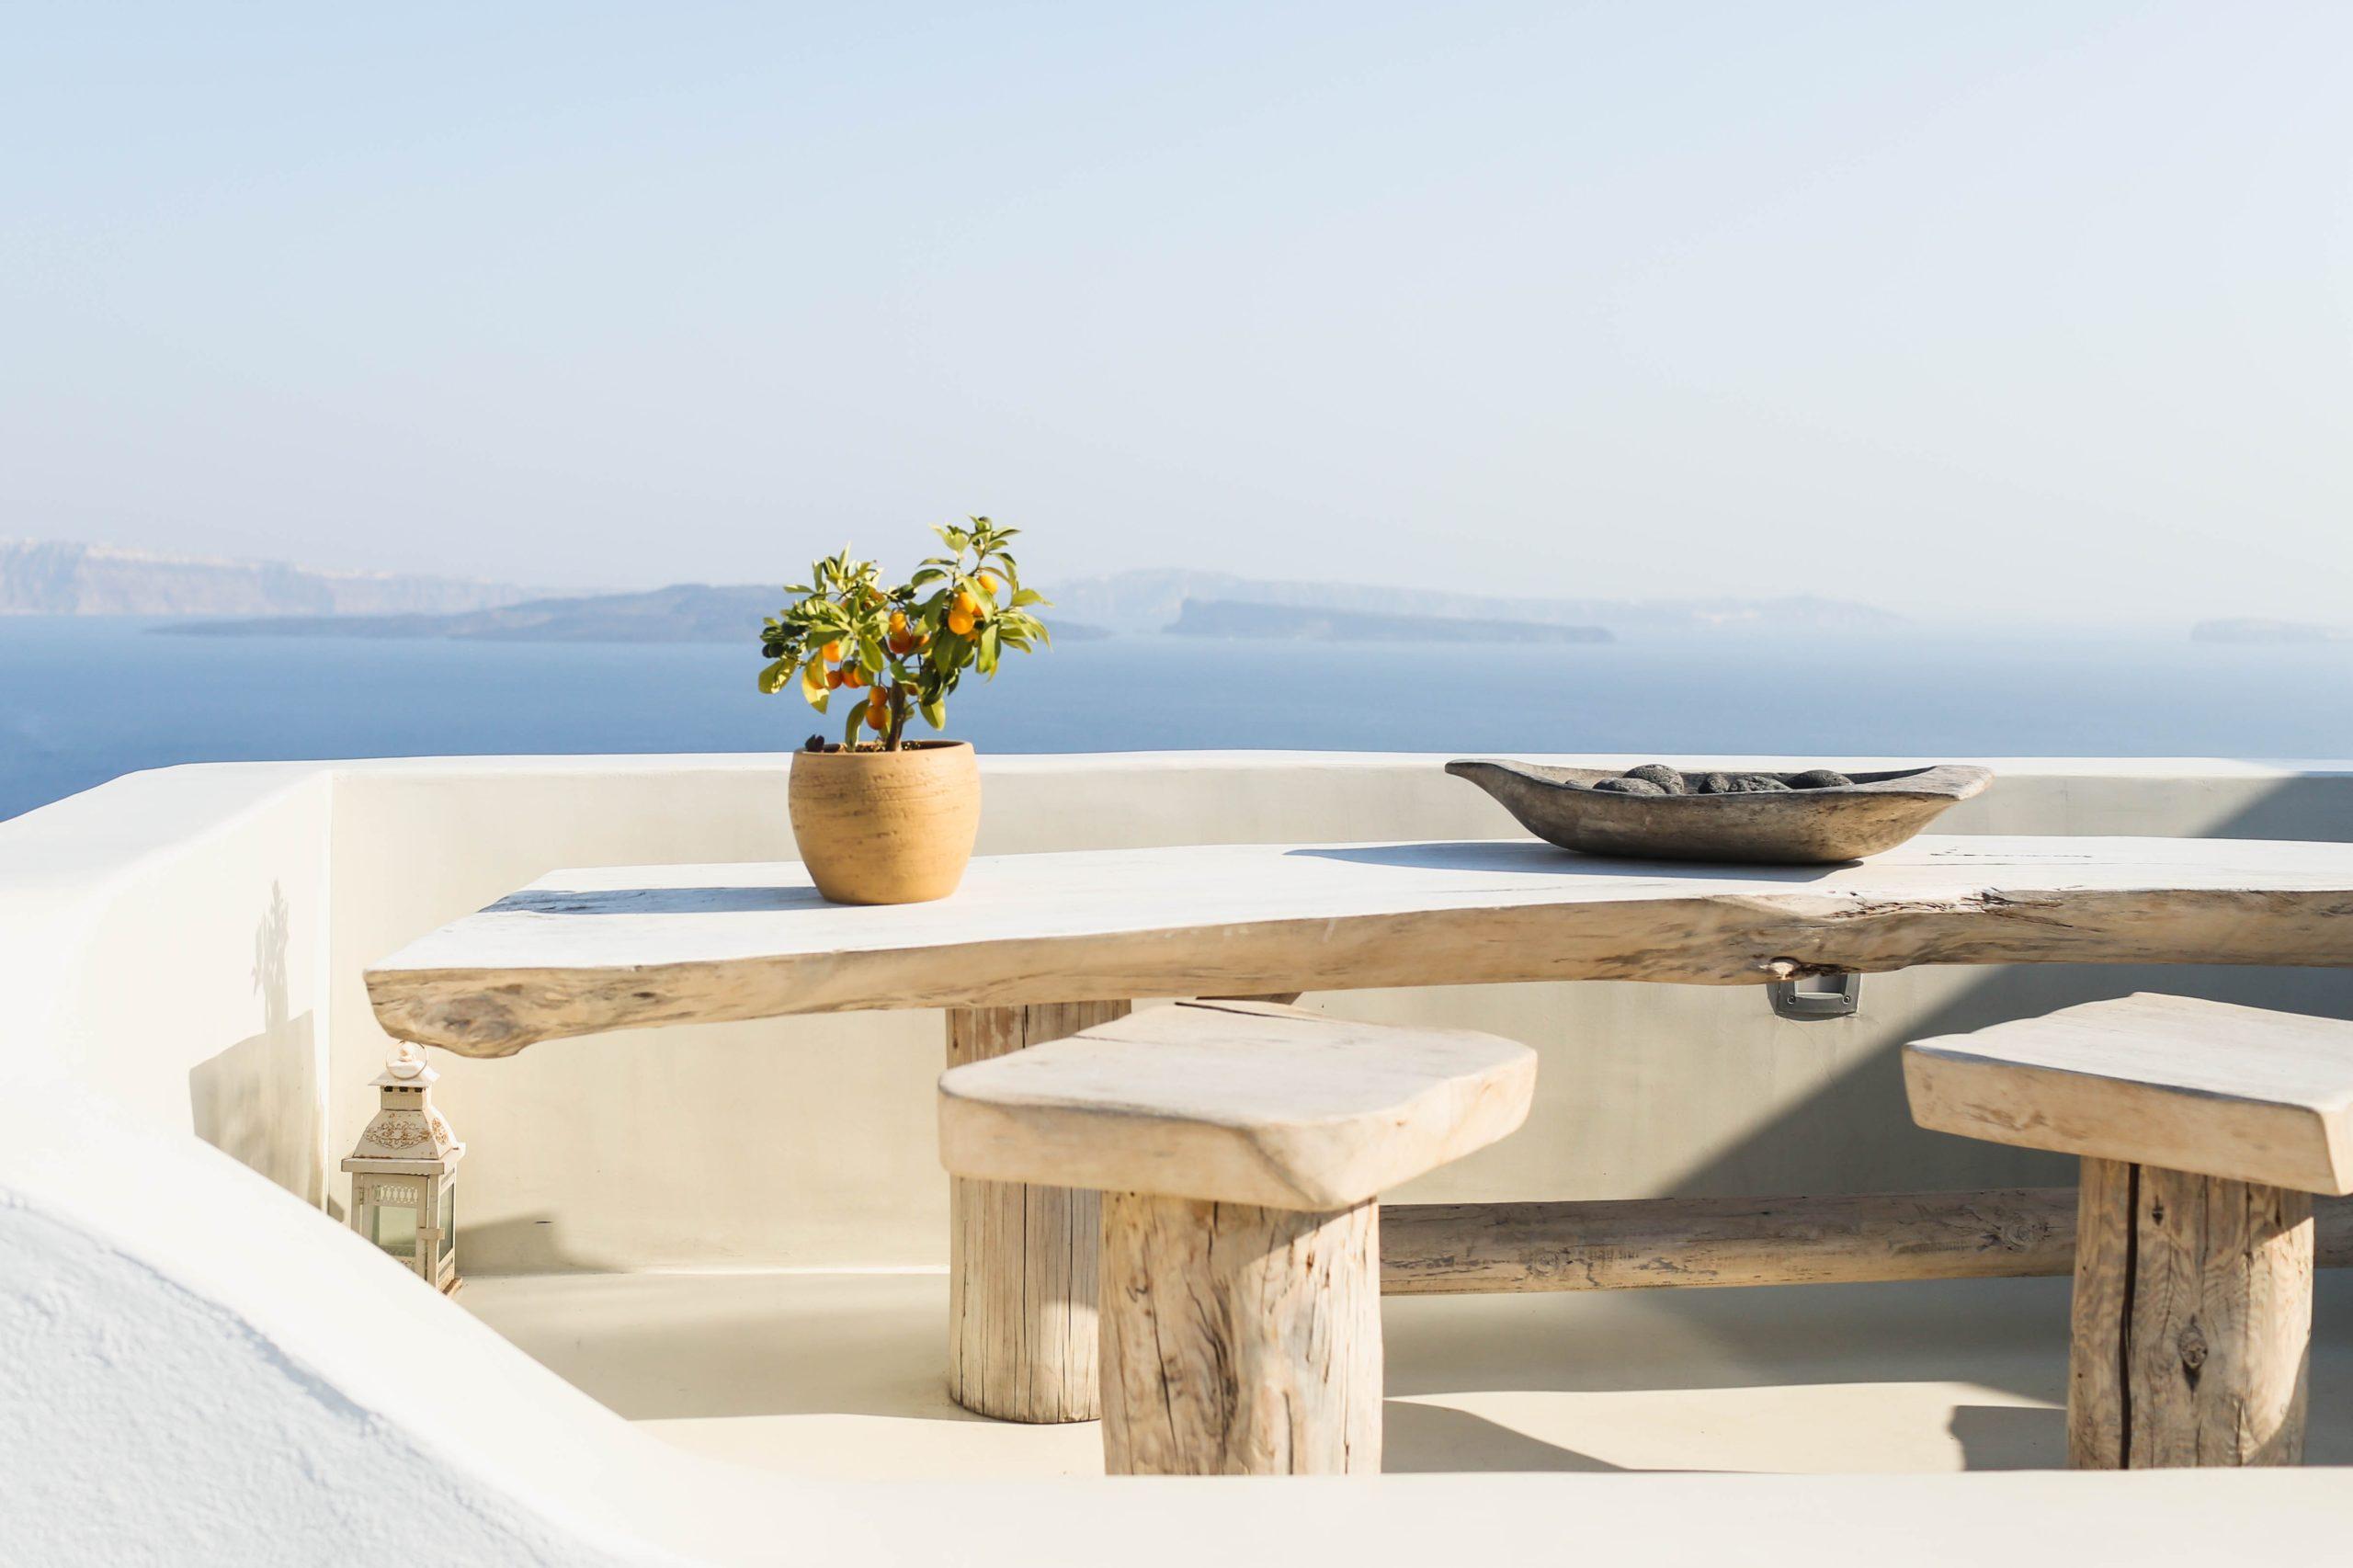 live edge wood table overlooking ocean